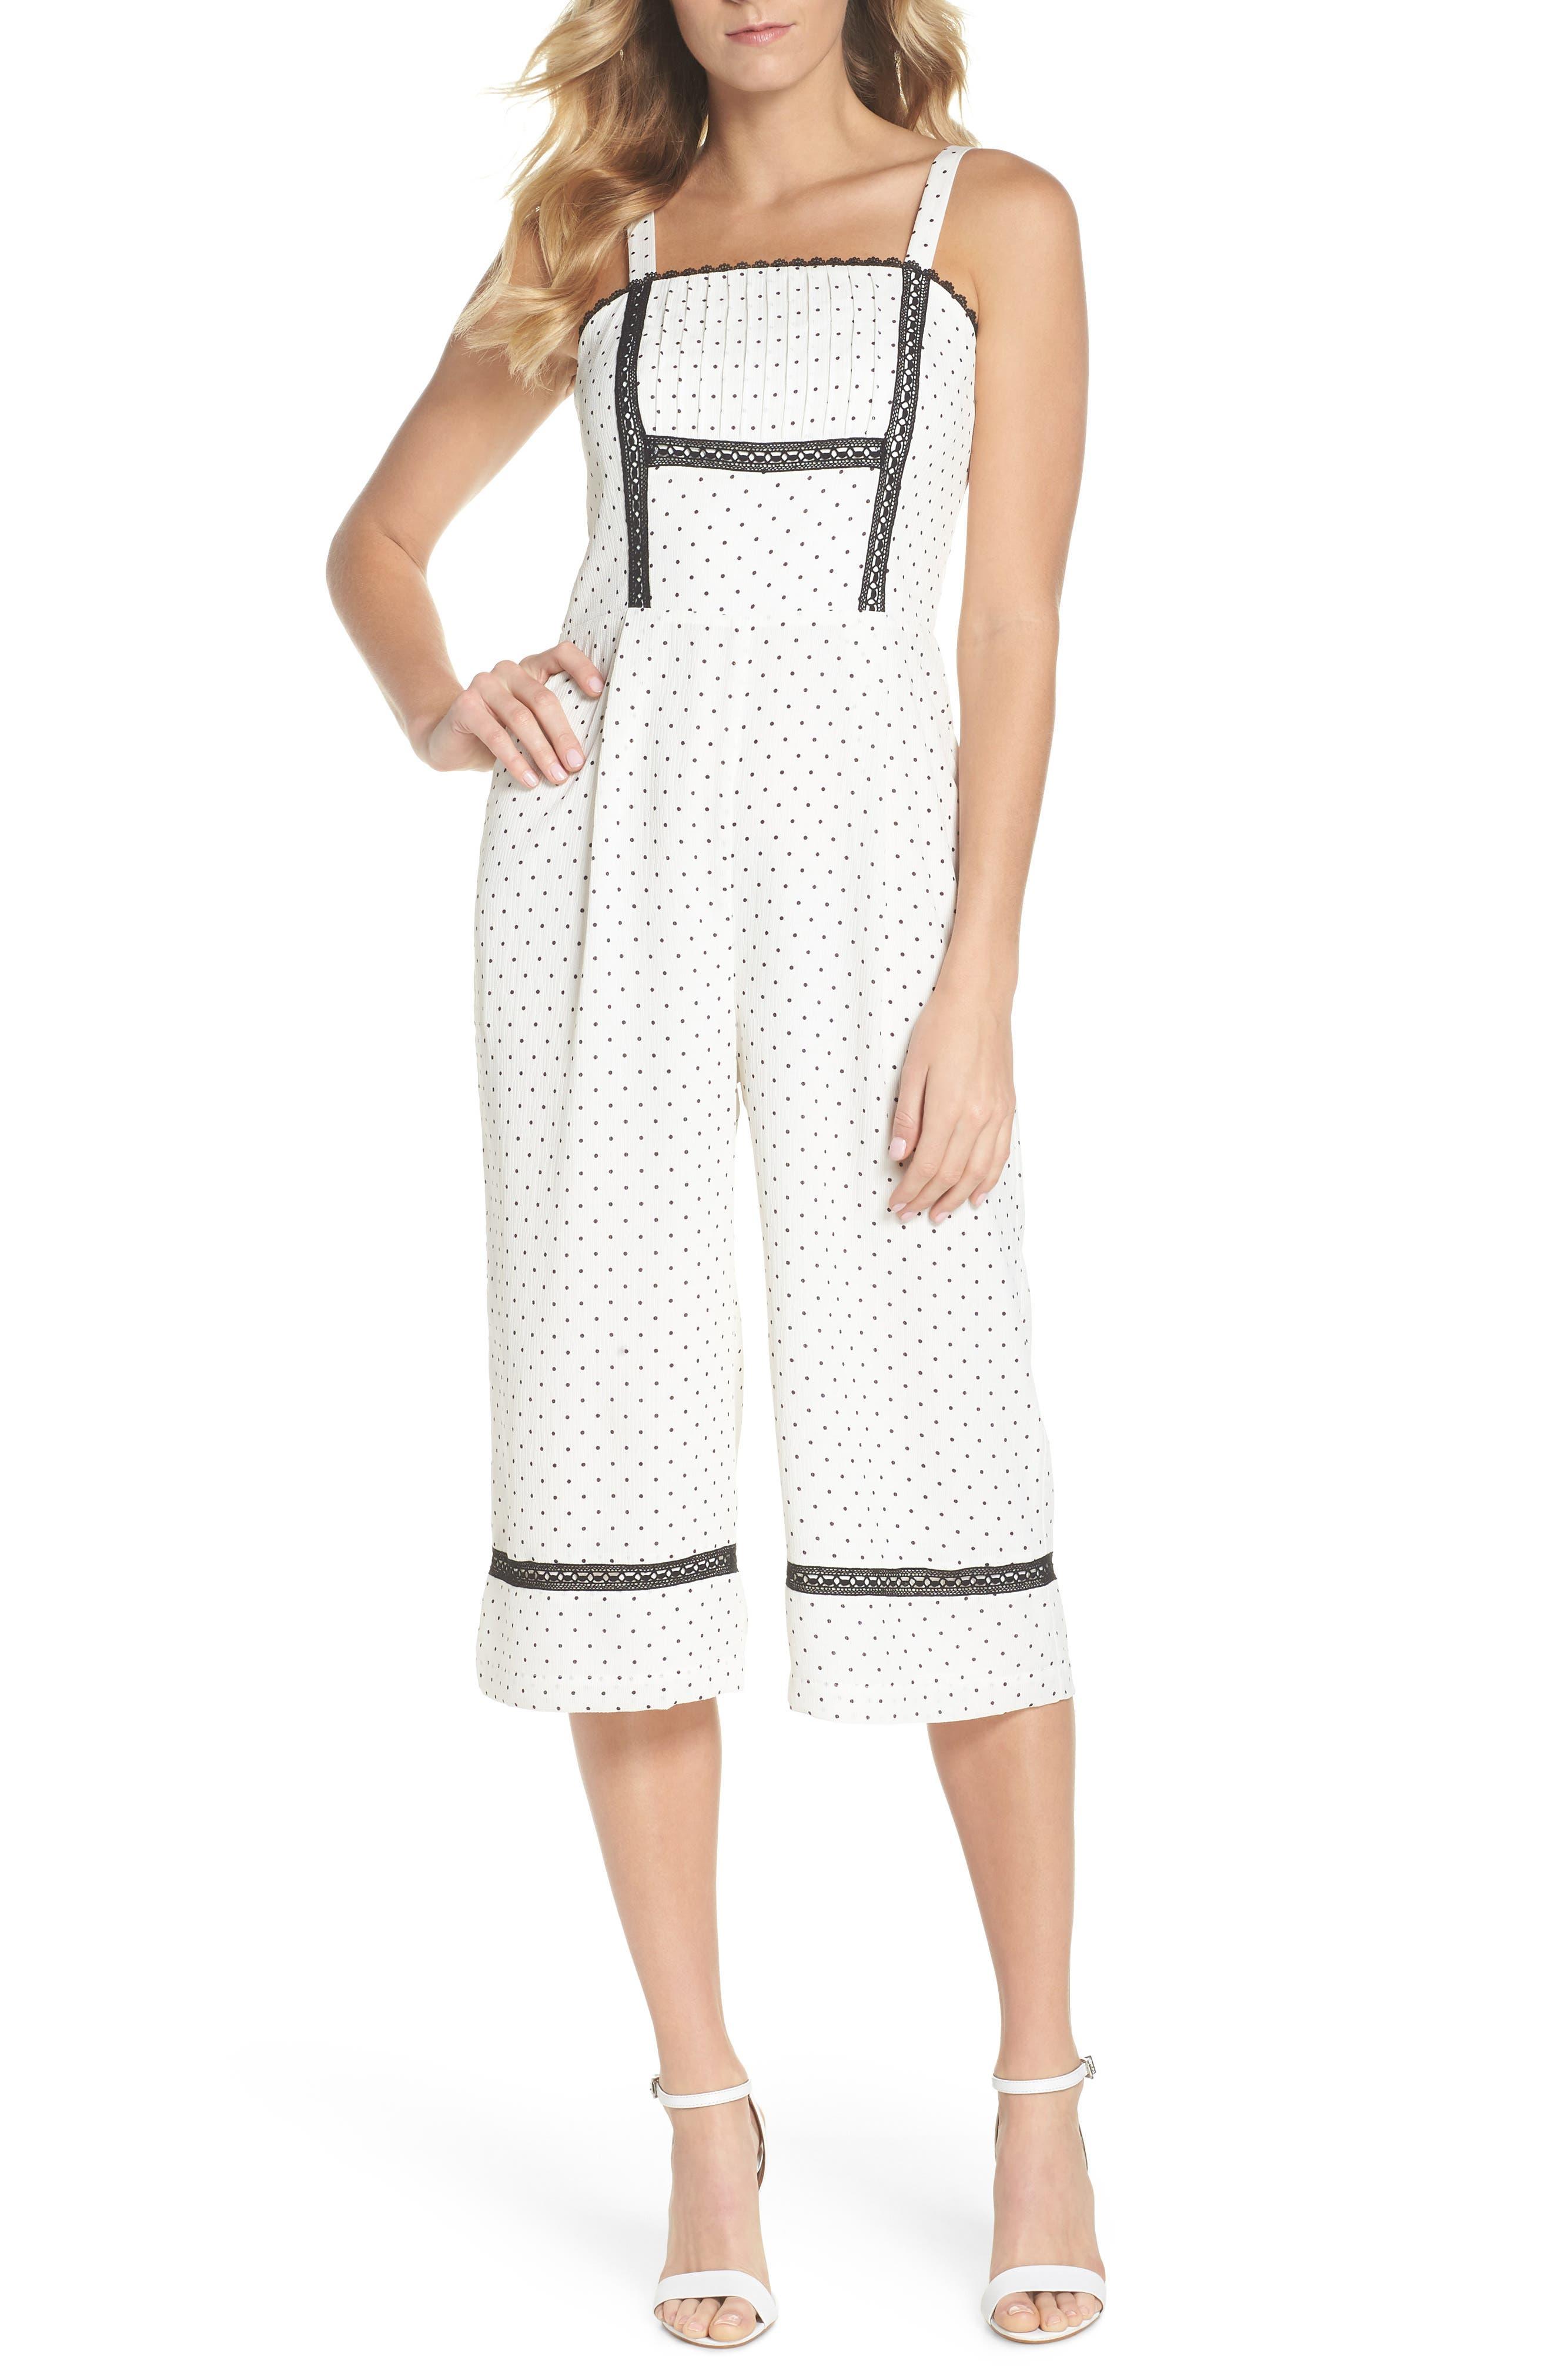 Nadine Polka Dot Culotte Jumpsuit,                         Main,                         color, White/ Black